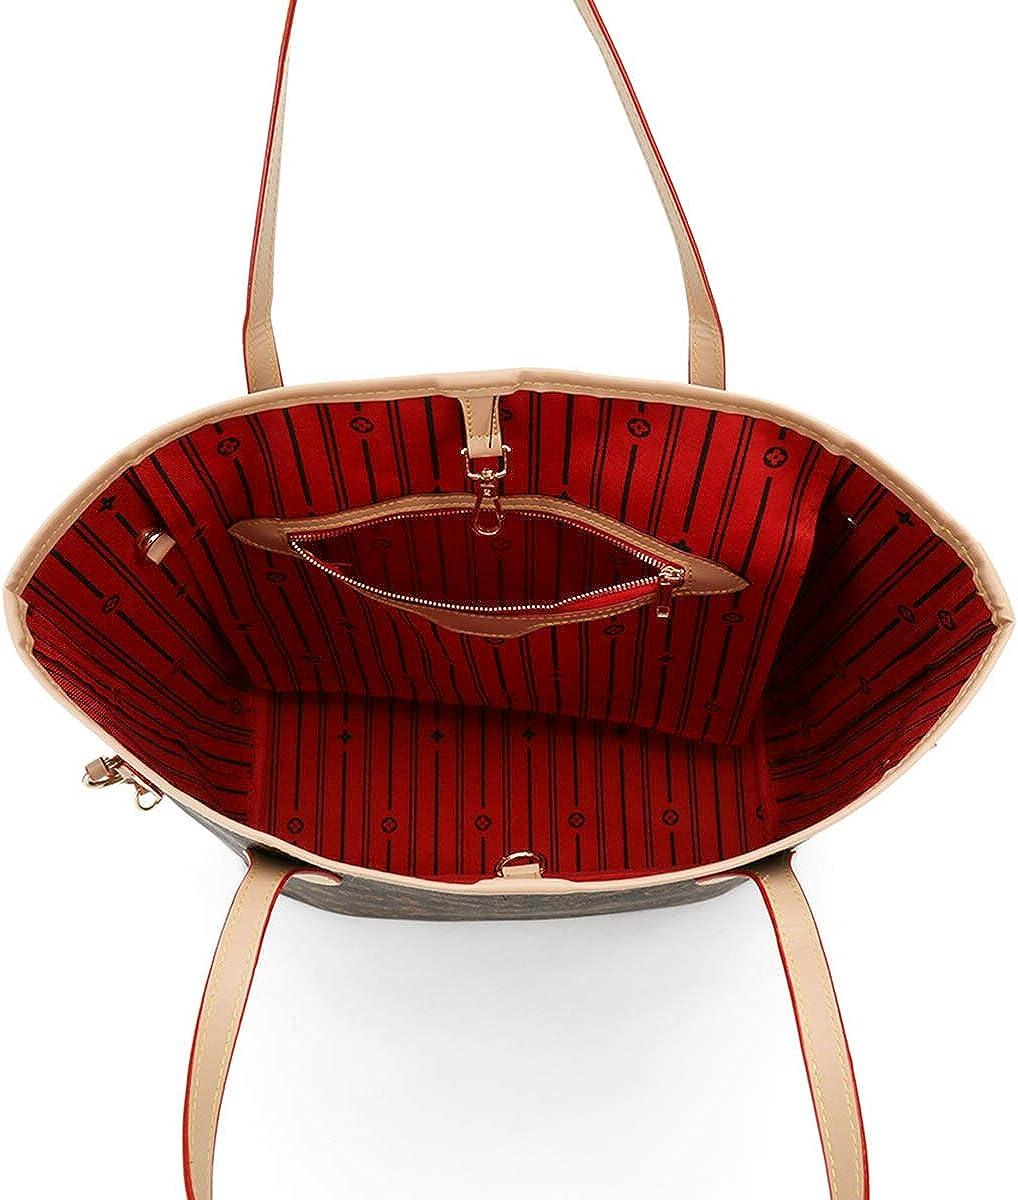 Ladys Shoulder Crossbody bags Metal chain messenger bag daily necessities small satchel handbag for women